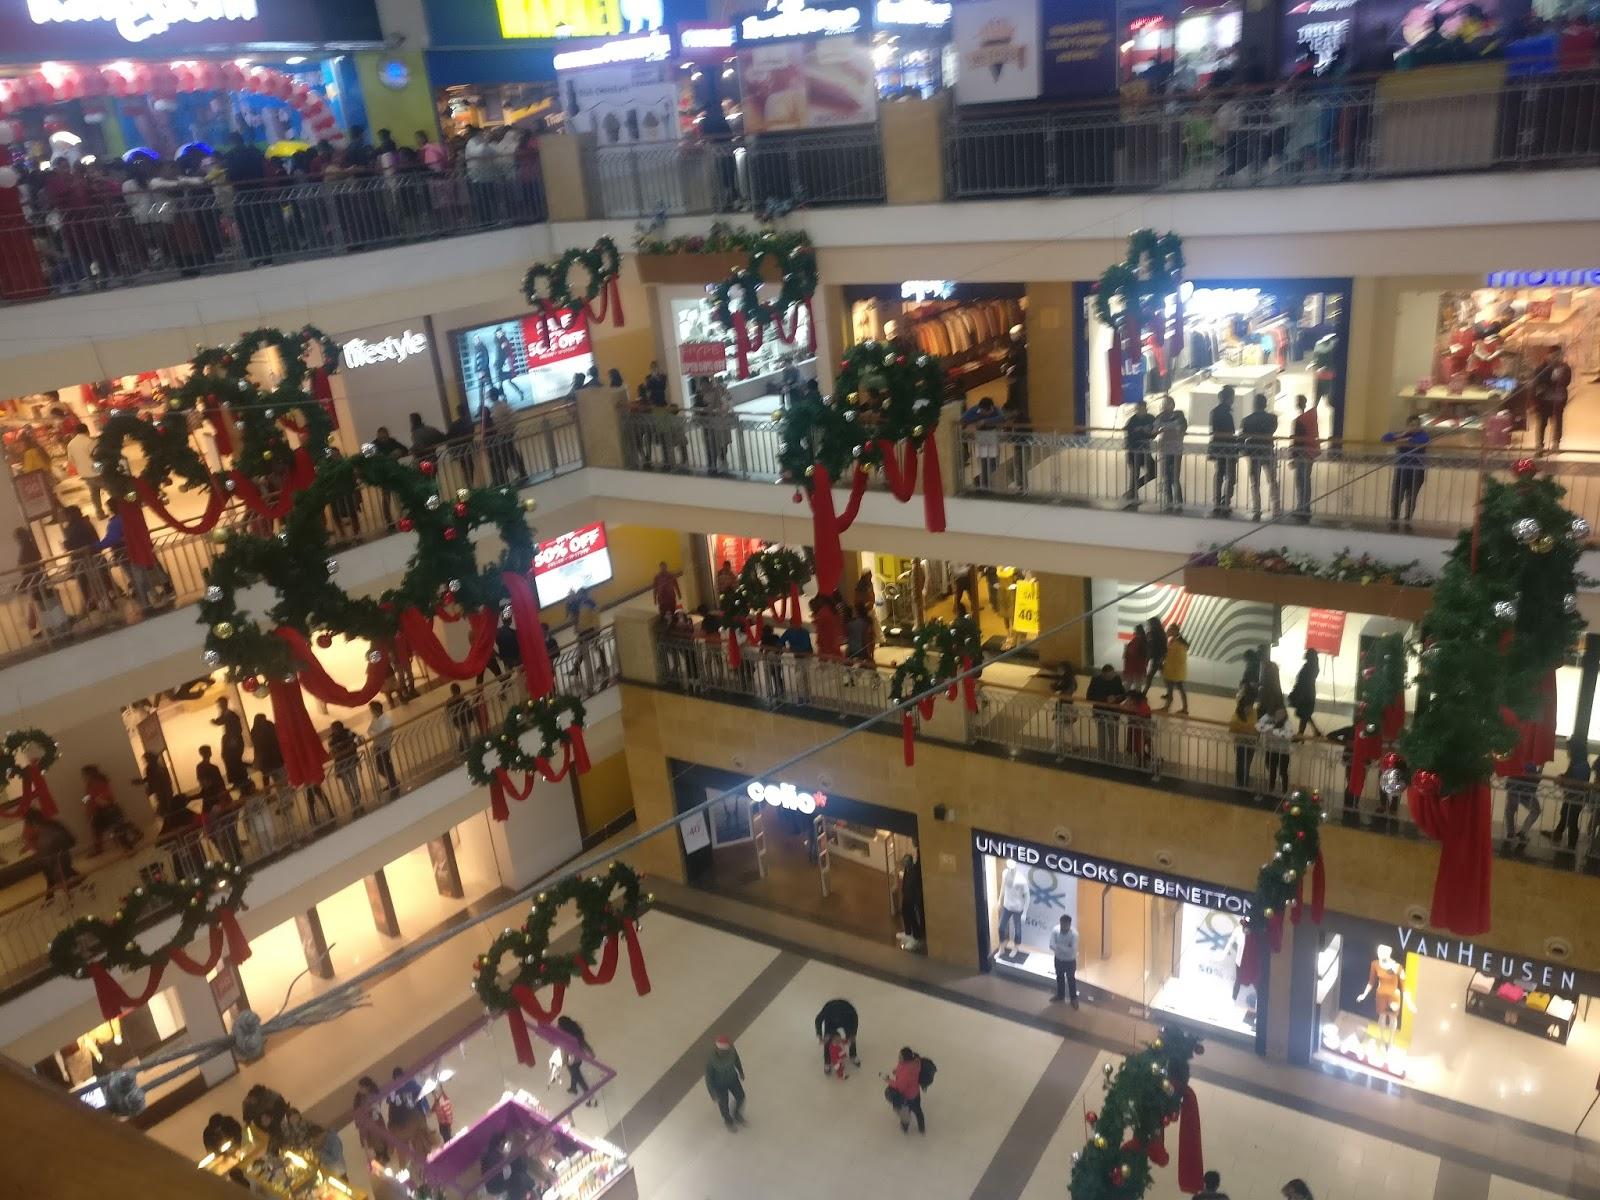 Sembrar ayudar Estragos  Mindless Satire: Merry Xmas in Pacific Mall, Dehradun